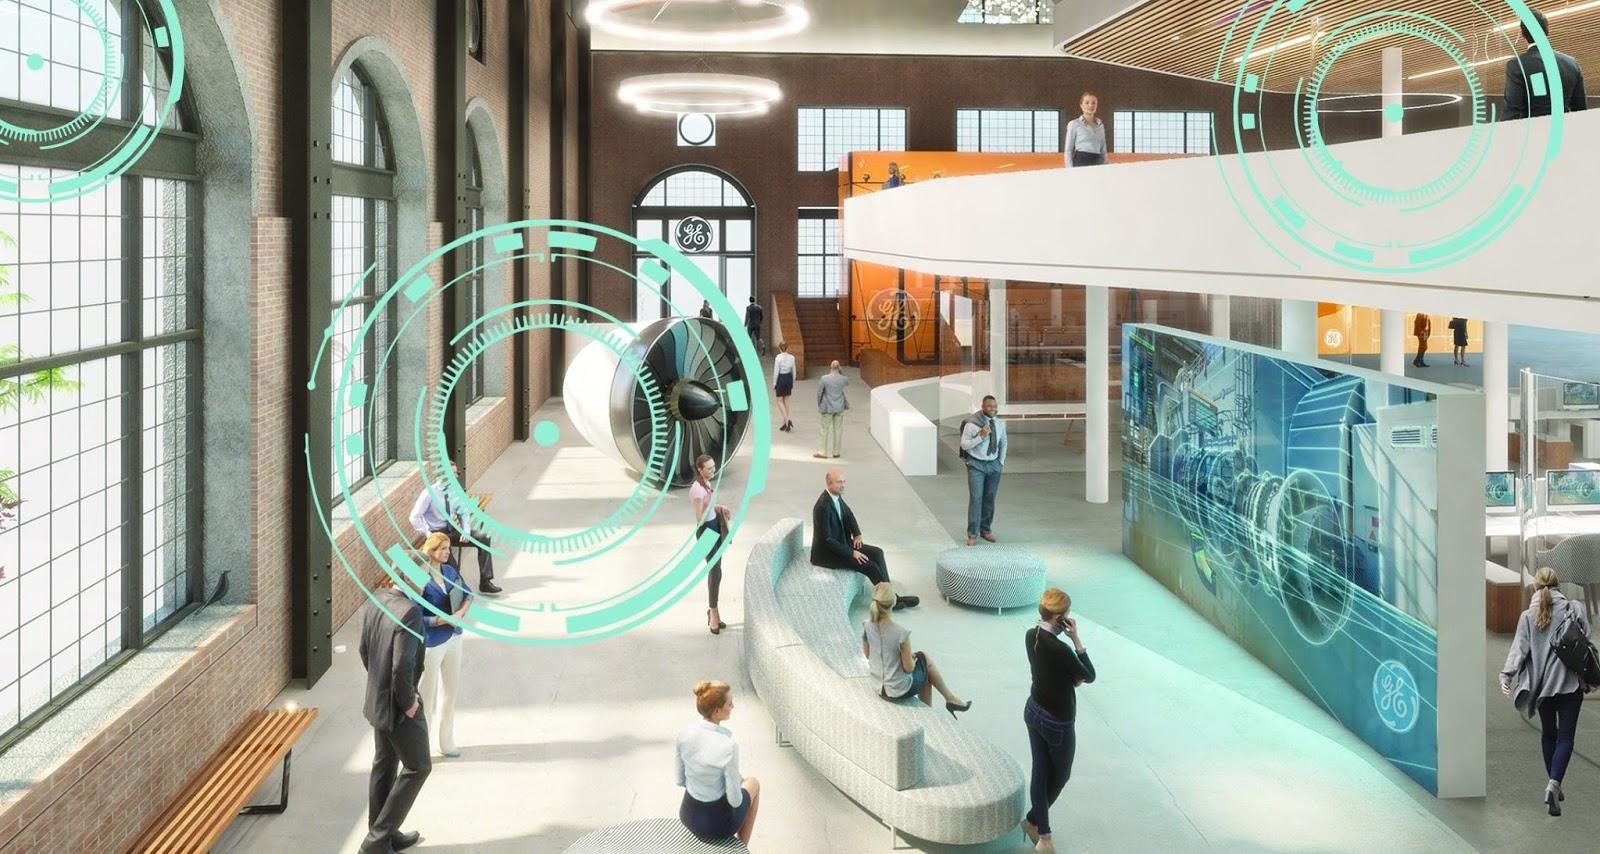 Retrofit maximizing boston s unique industrial architecture for modern office culture